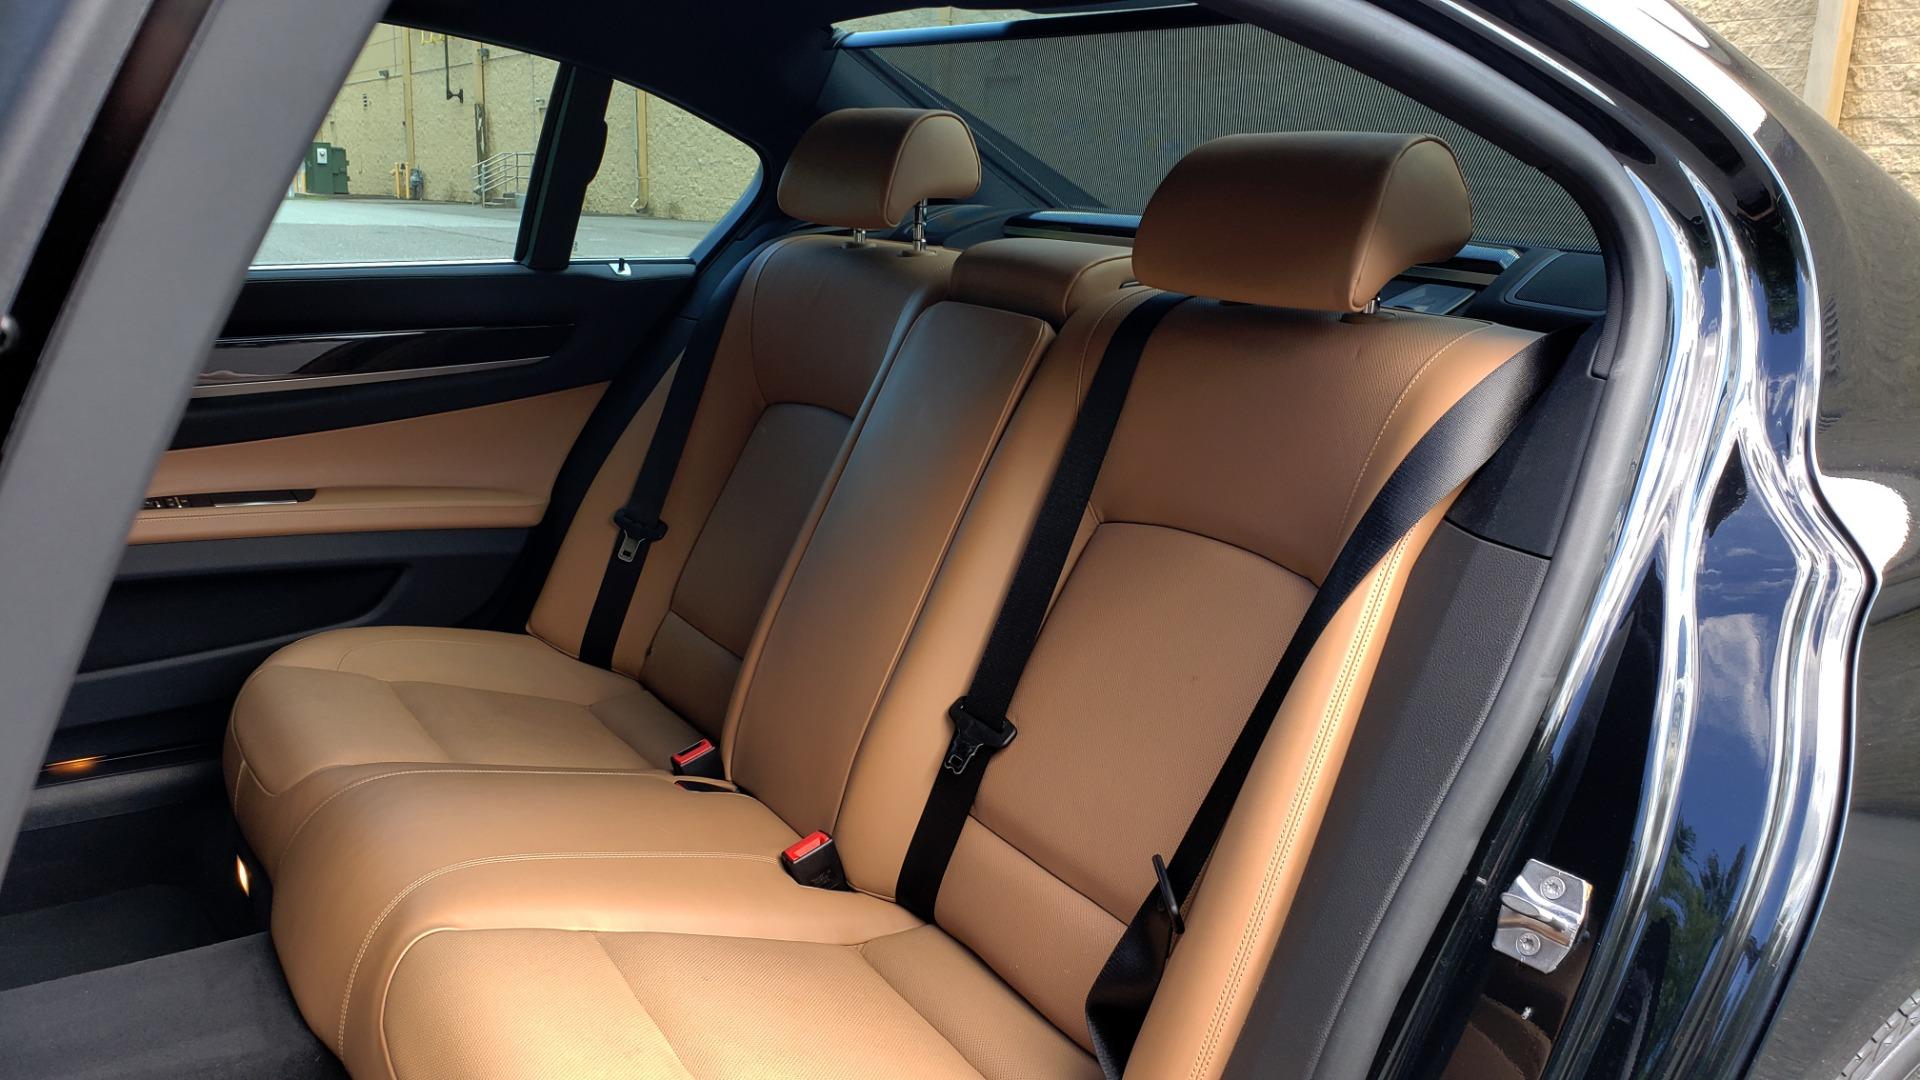 Used 2014 BMW 7 SERIES 750LI M-SPORT / EXEC PKG / DRVR ASST / LIGHTING / NAV / SUNROOF for sale Sold at Formula Imports in Charlotte NC 28227 59